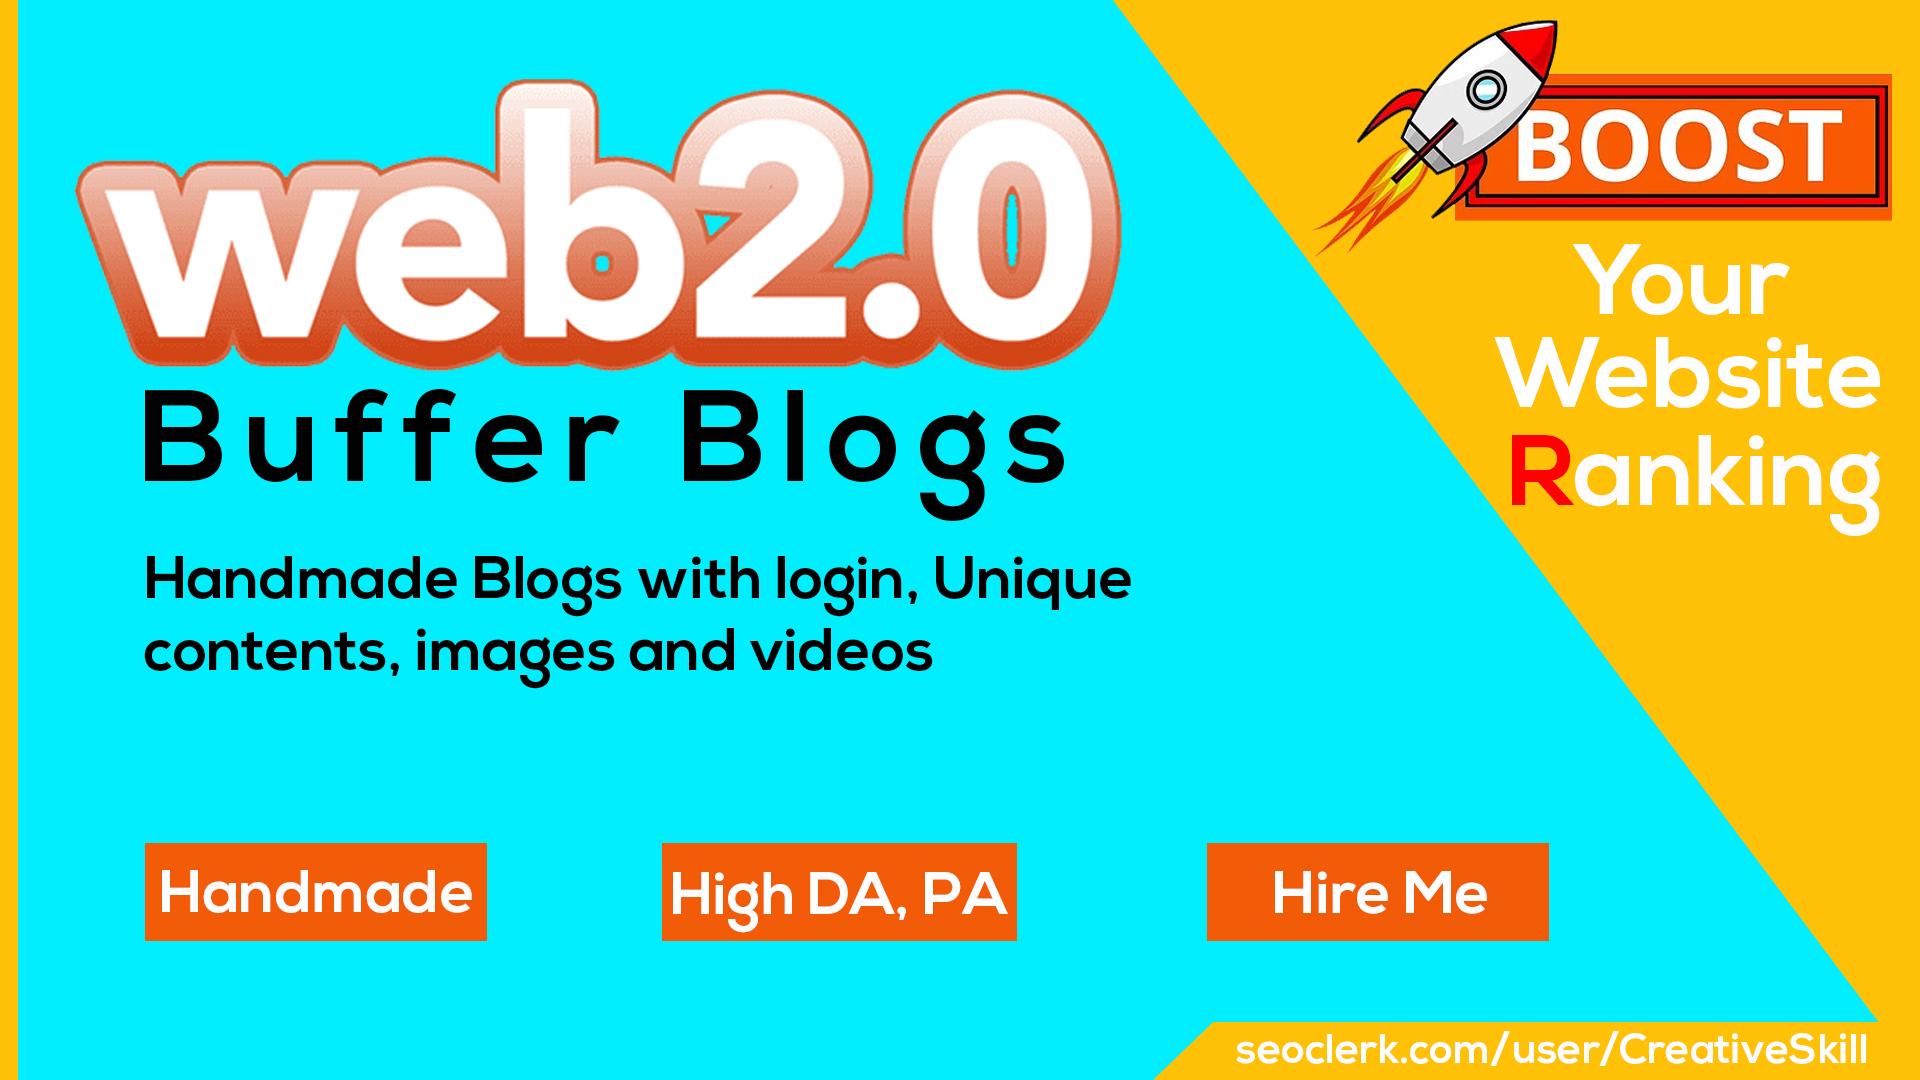 Manually Create 10 Web 2.0 Buffer Blogs With Login Get Bonus 10 Posts